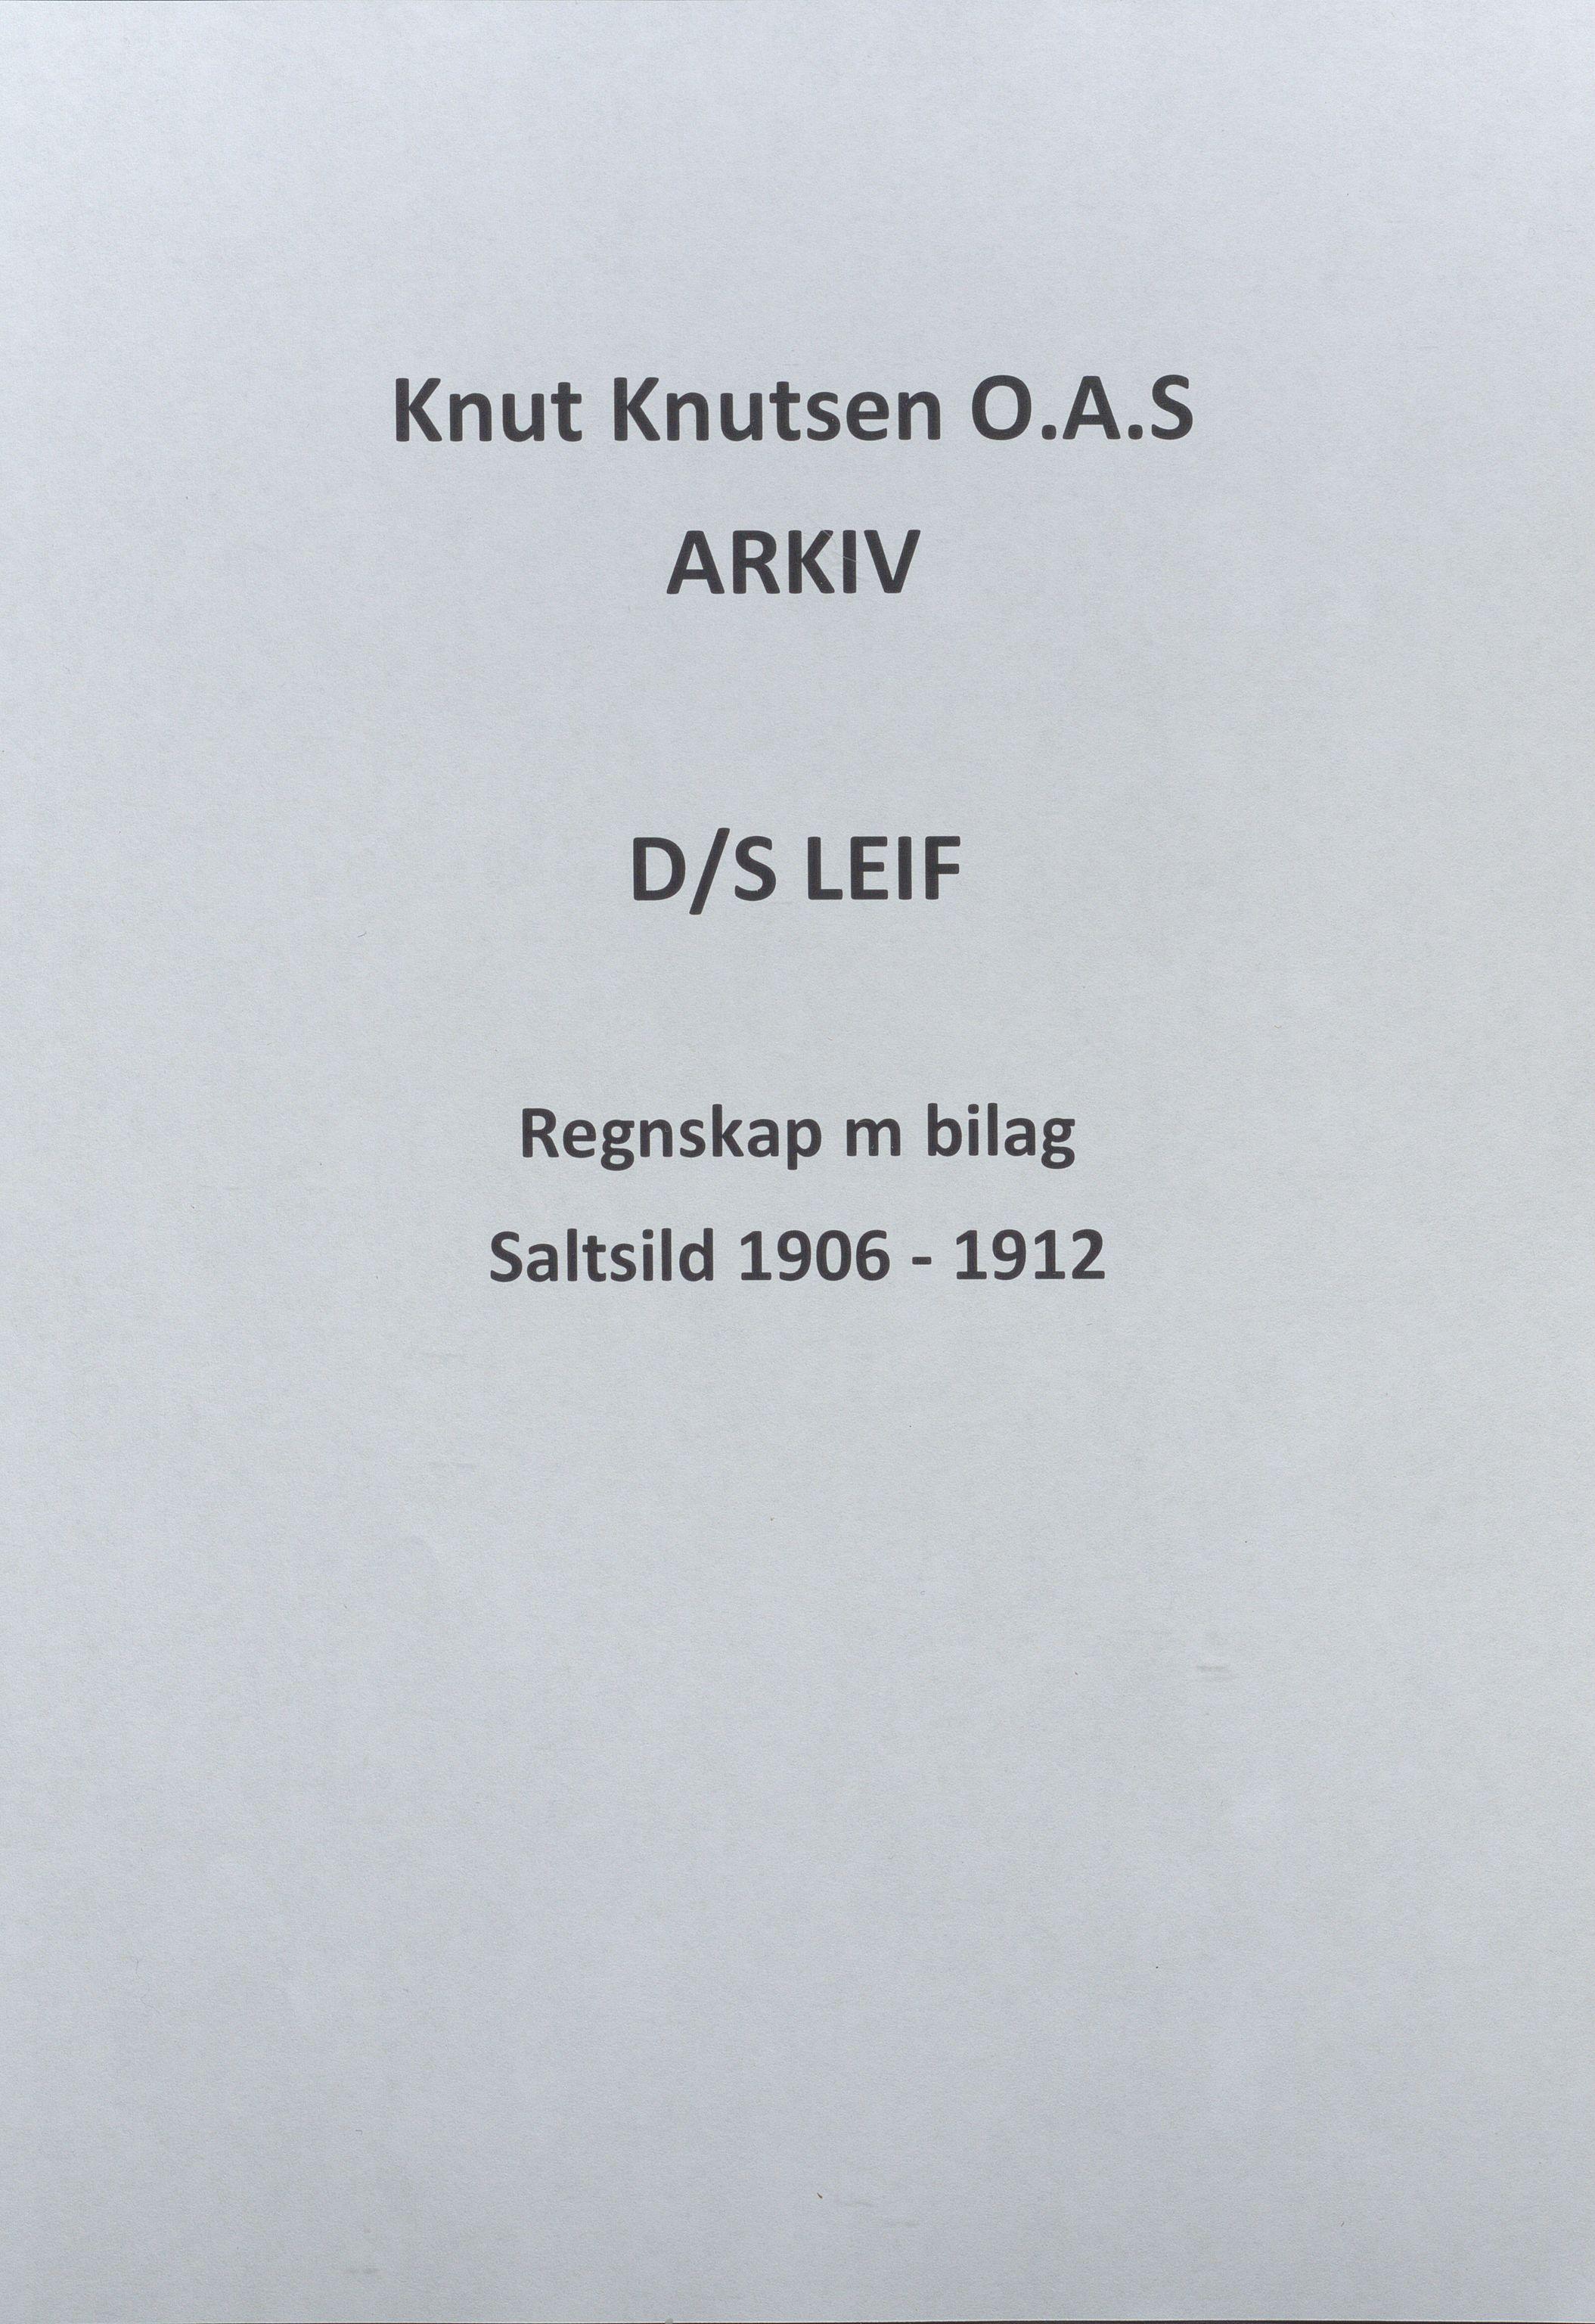 HABI, Knut Knutsen O.A.S., 1906-1912